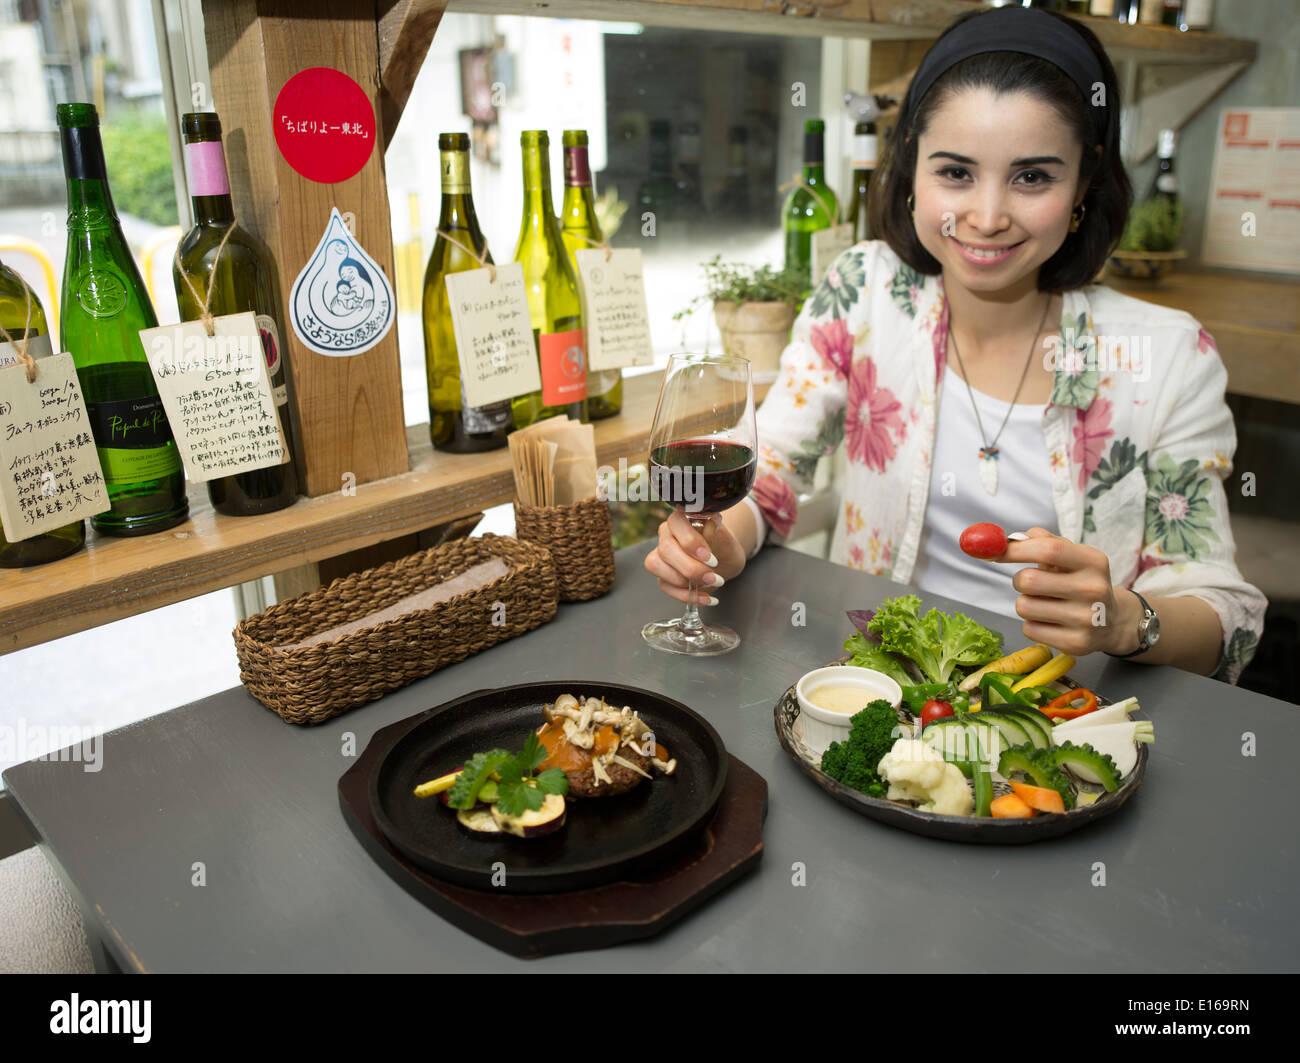 Customer (model released) eating at Ukishima Garden vegan cafe /  restaurant, Naha, Okinawa - Stock Image